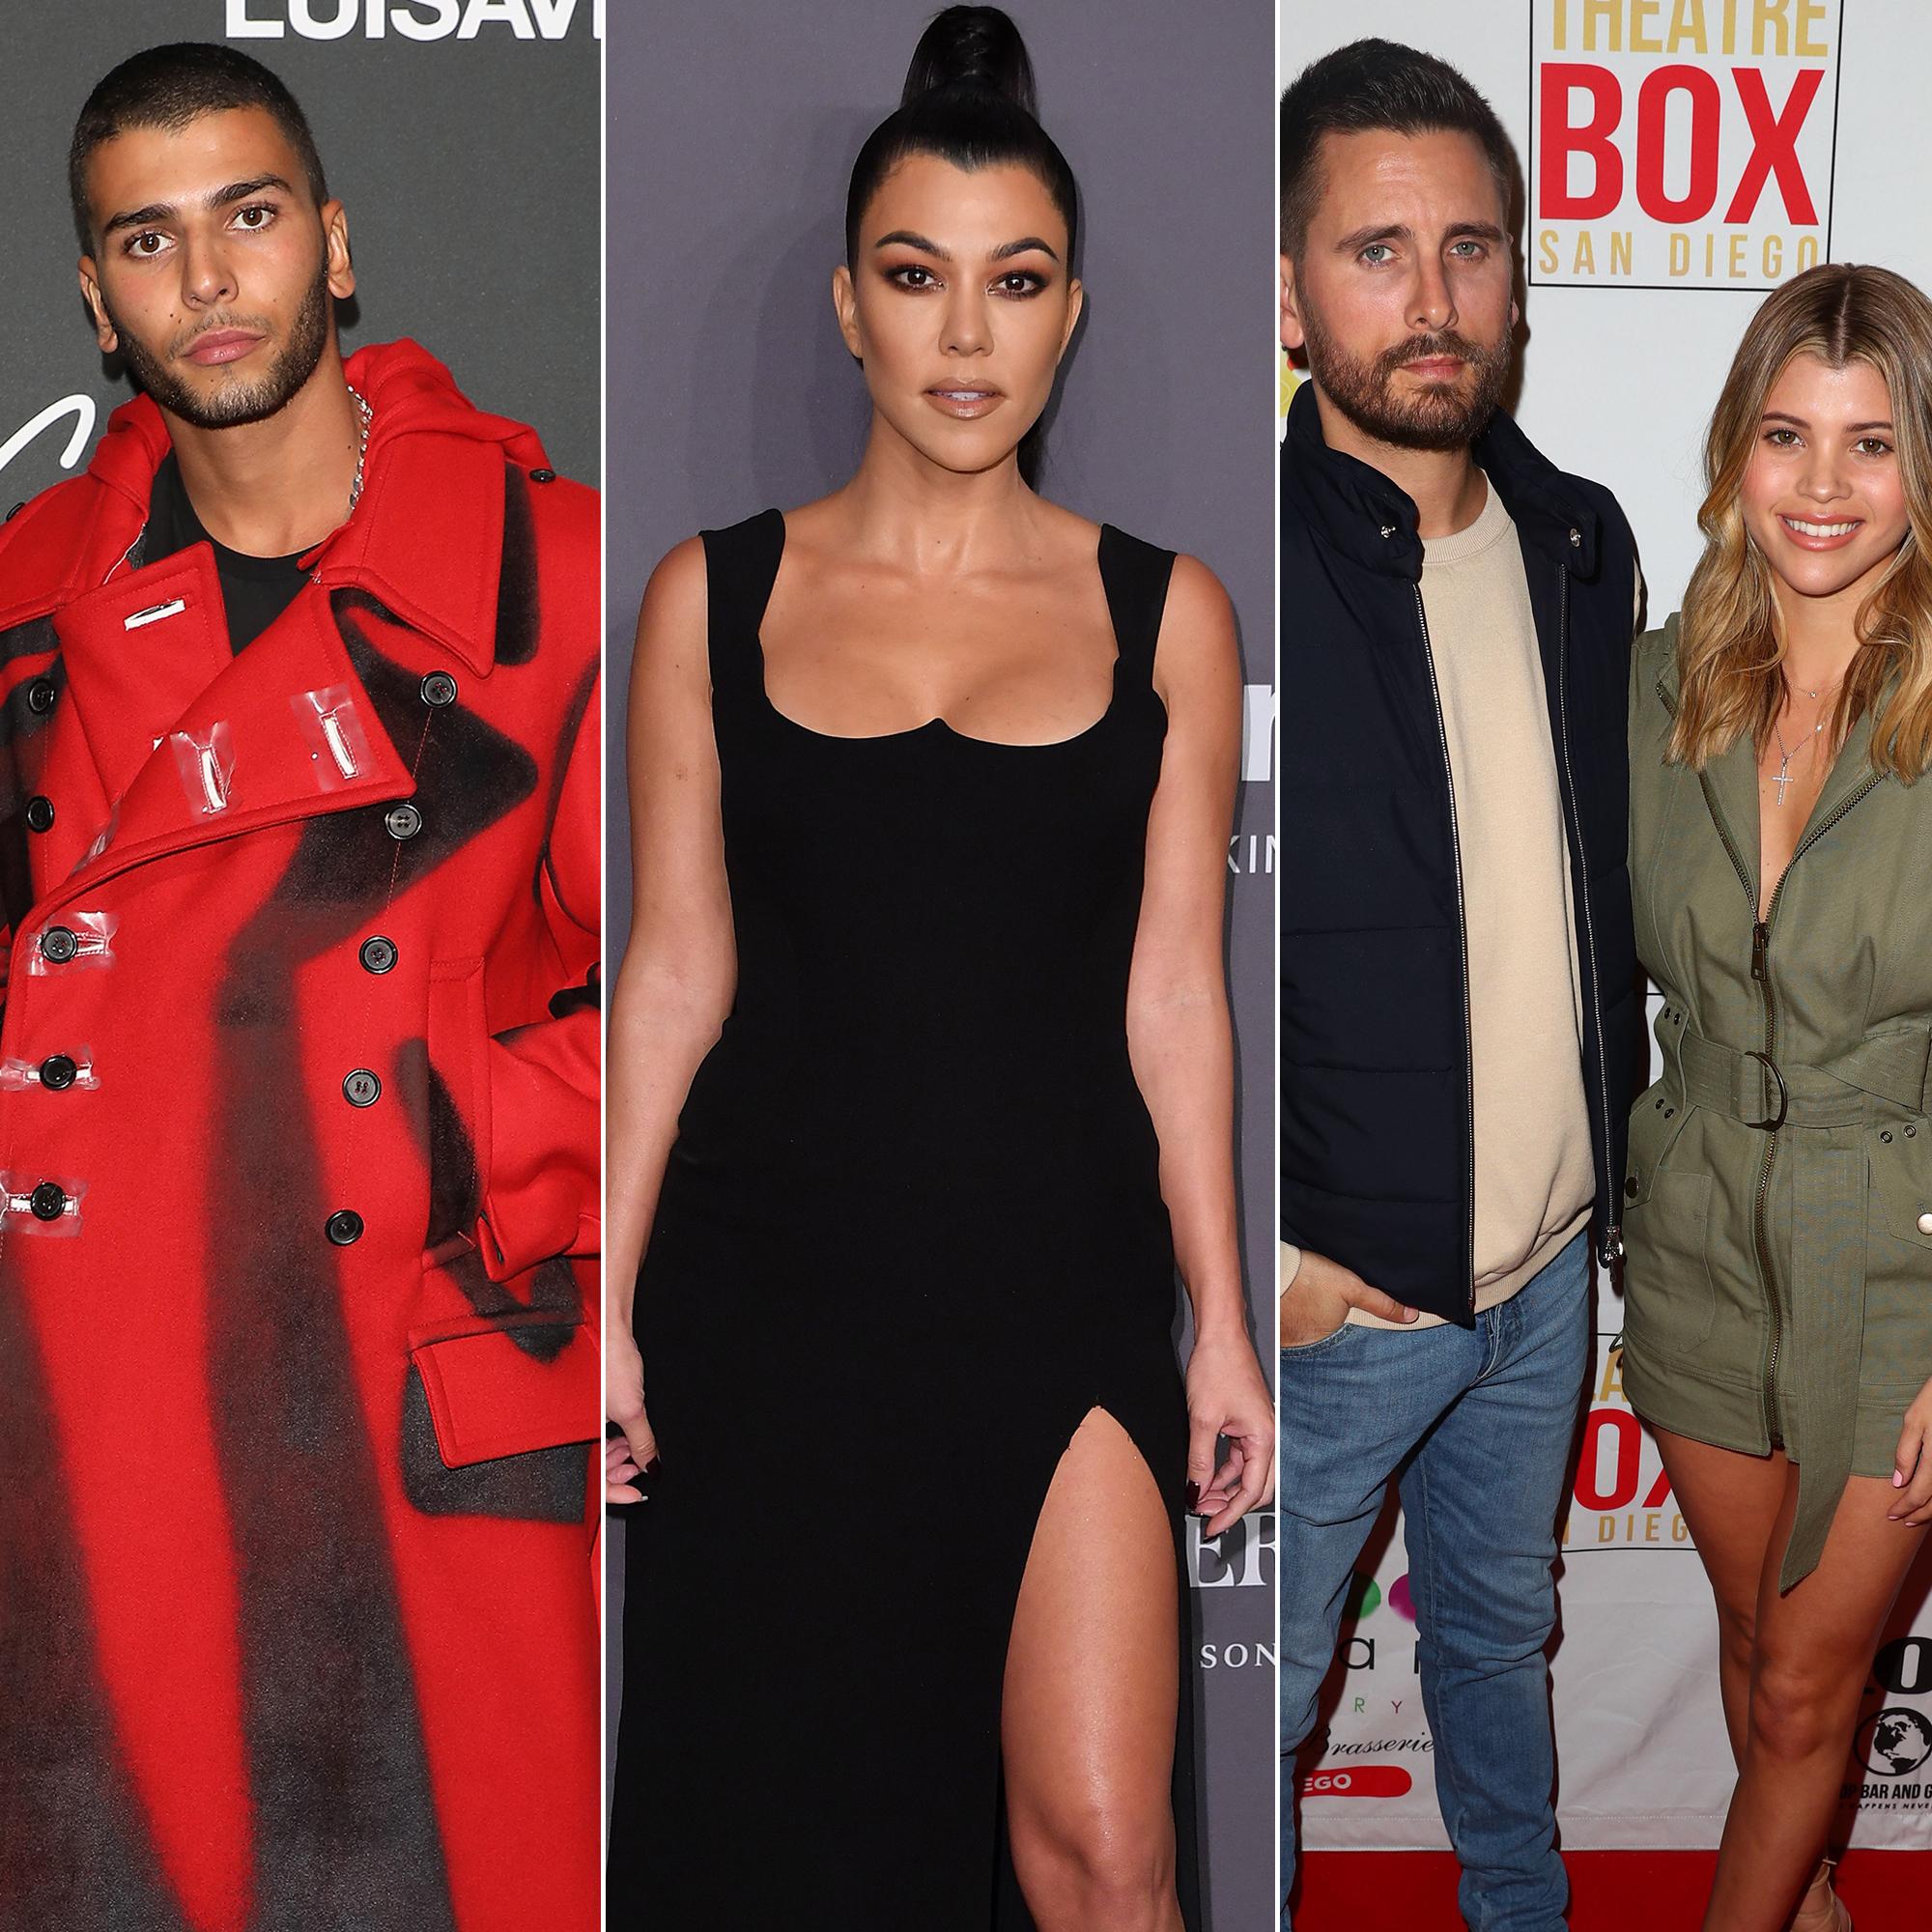 Kourtney Kardashian Birthday Party - Younes Bendjima, Kourtney Kardashian and Scott Disick with Sofia Richie.